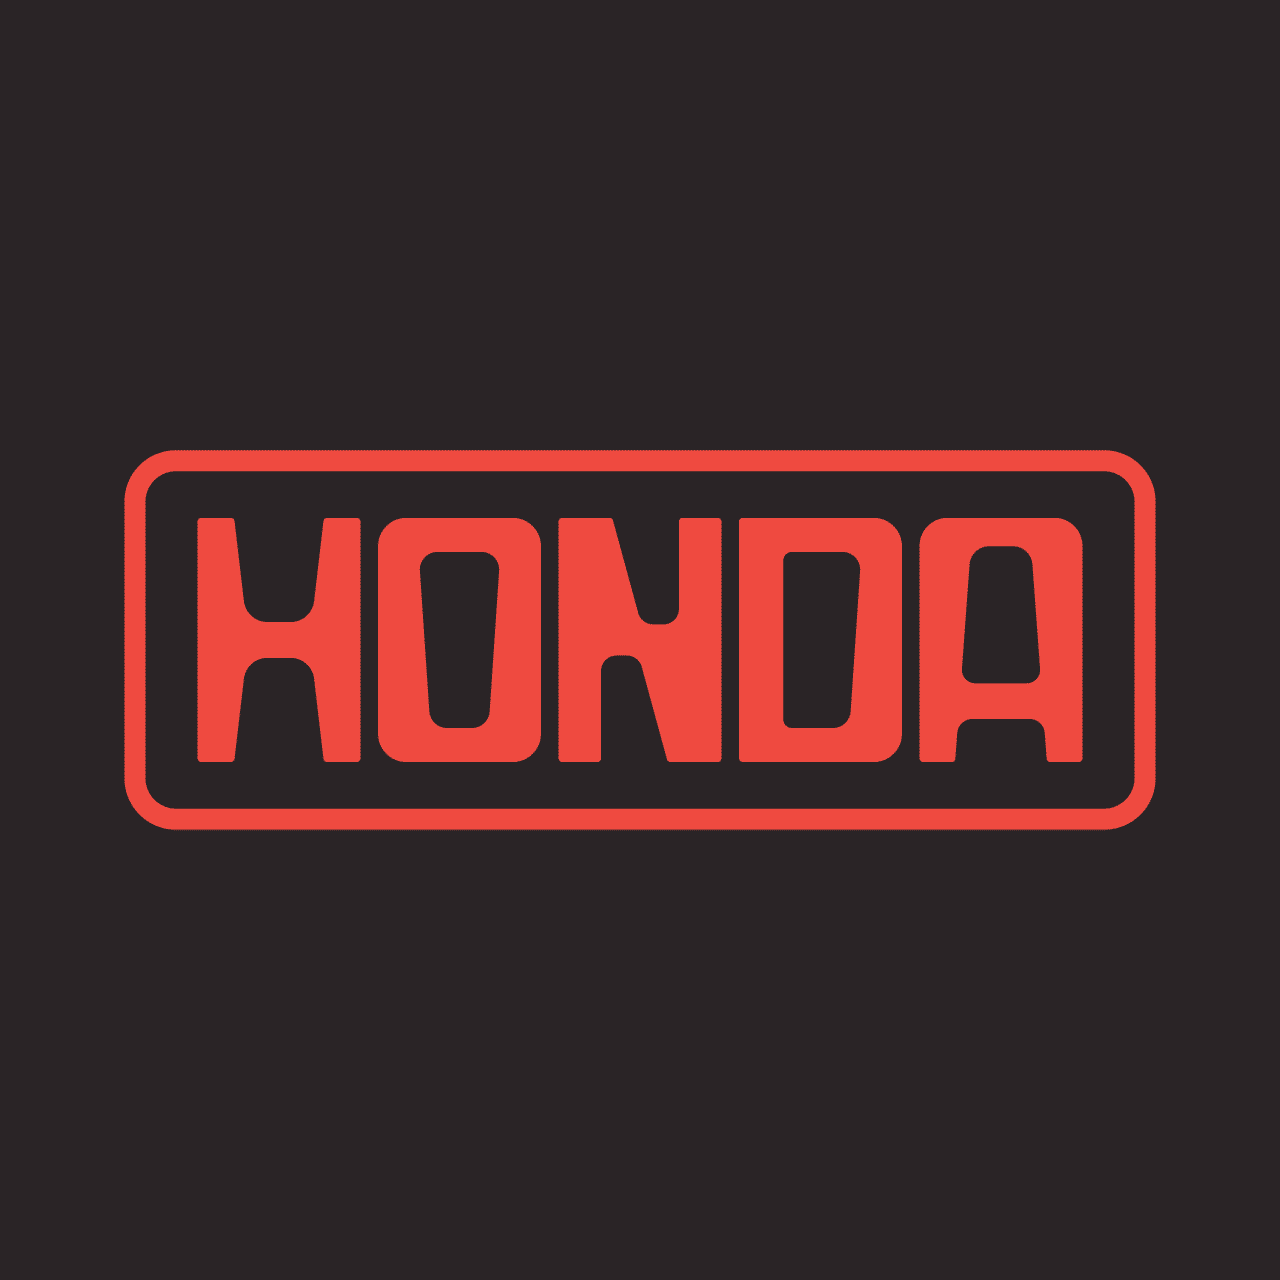 homda vintage logo rafael serra